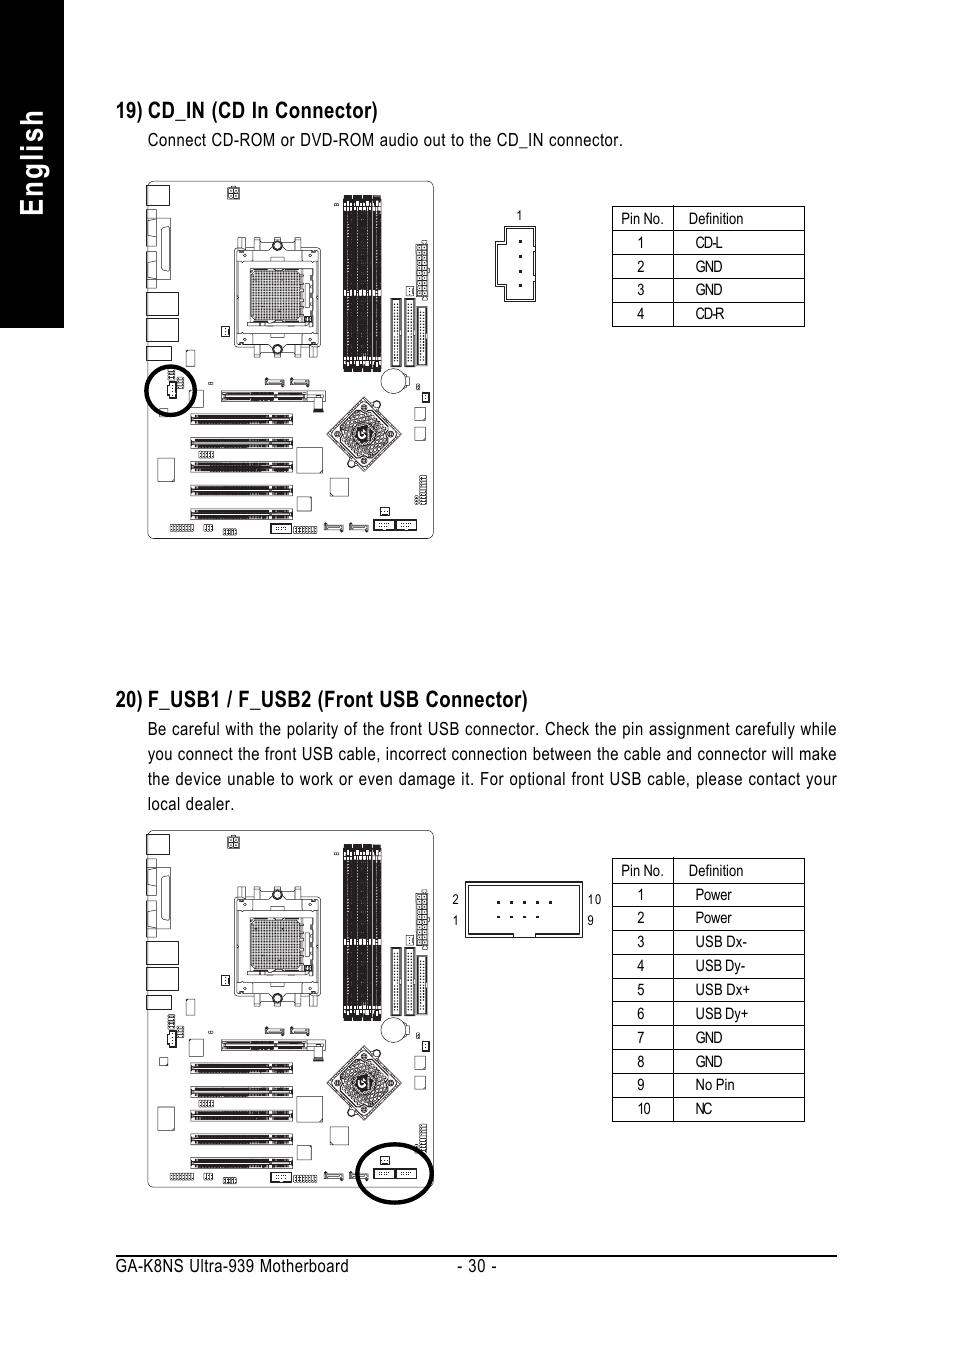 Cdl Audio Manual Nc Gm Lan Non Bose Wiring Diagram Productmanualguidecom Screenshot Image Array English 19 Cd In Connector 20 F Usb1 Usb2 Front Usb